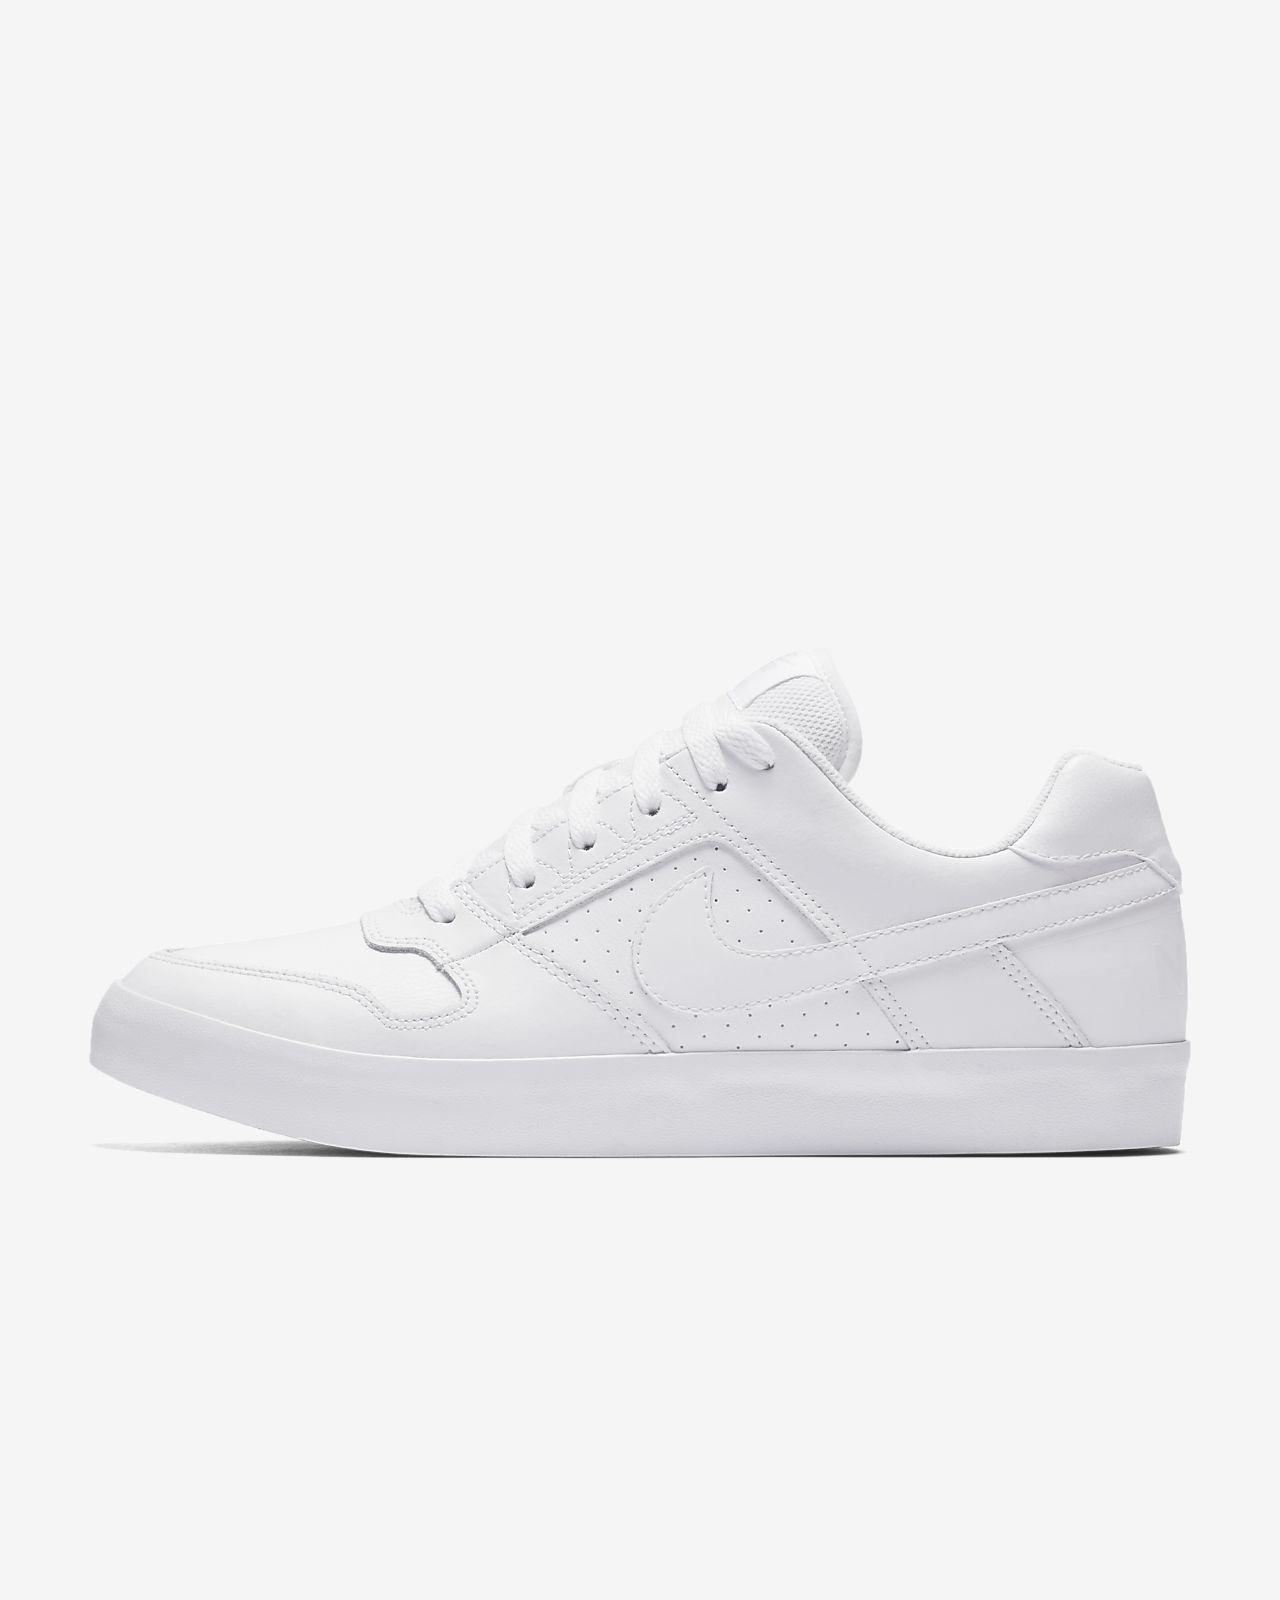 Nike SB Delta Force Vulc Herren Skateboardschuh